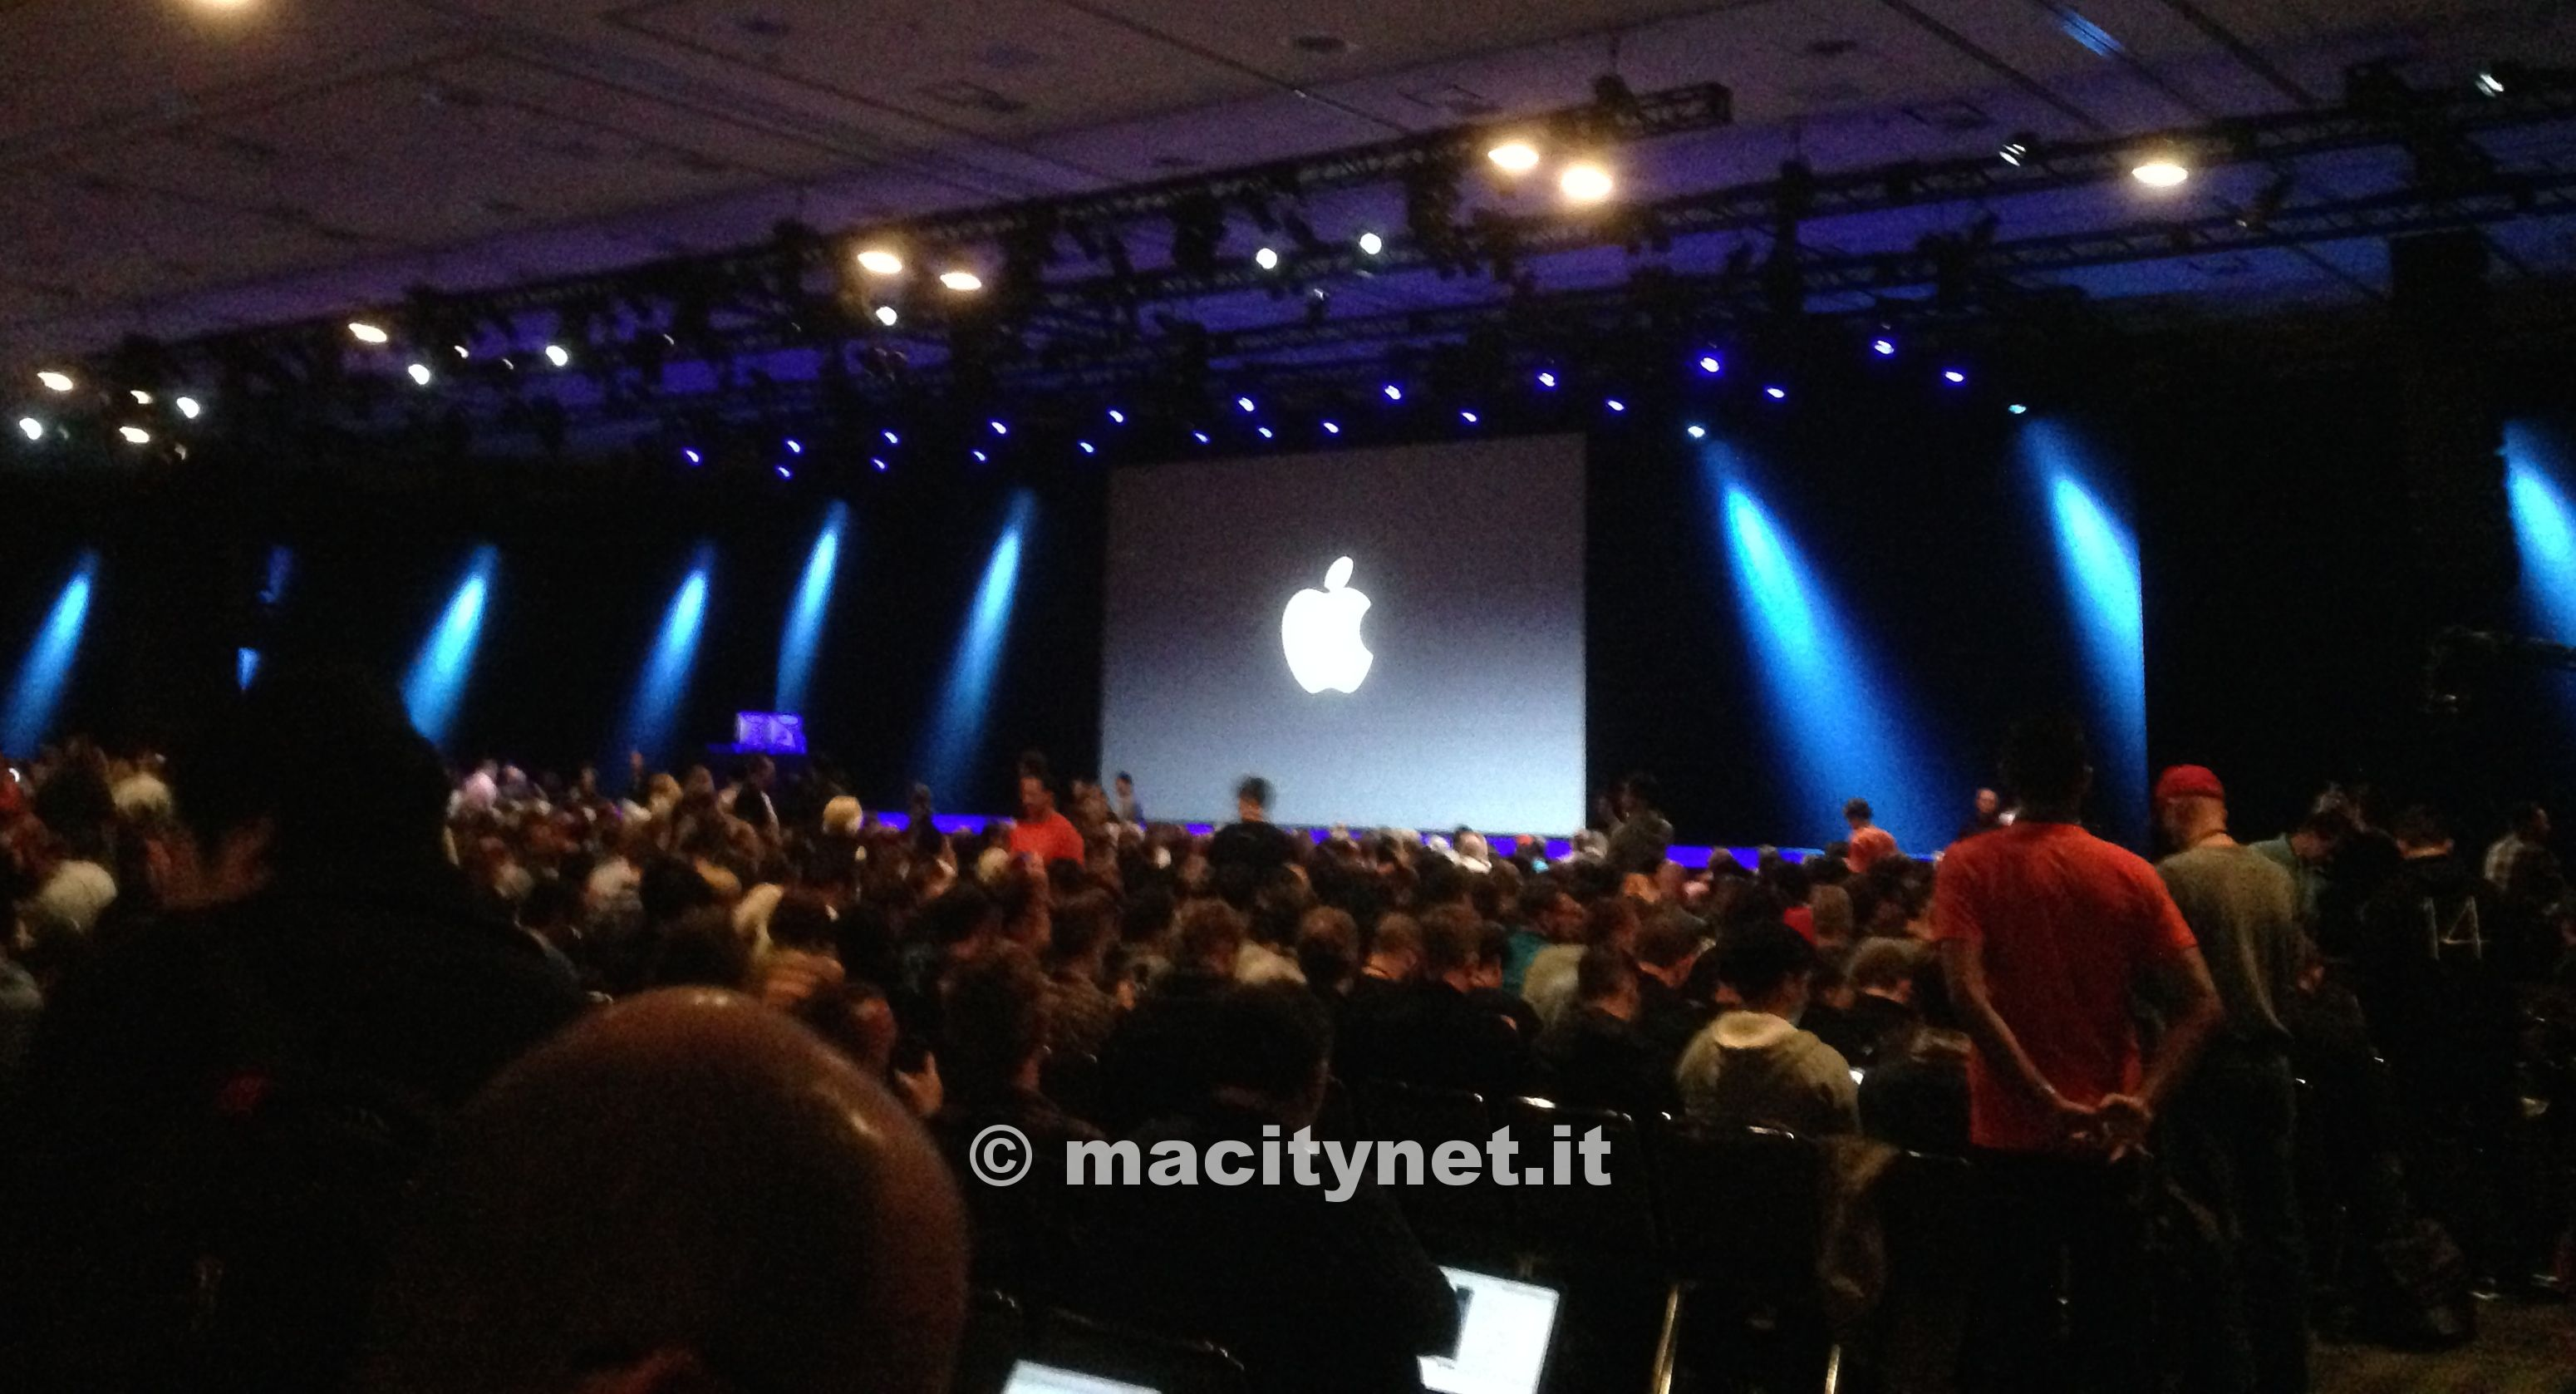 Tutto il keynote WWDC 2014 minuto per minuto